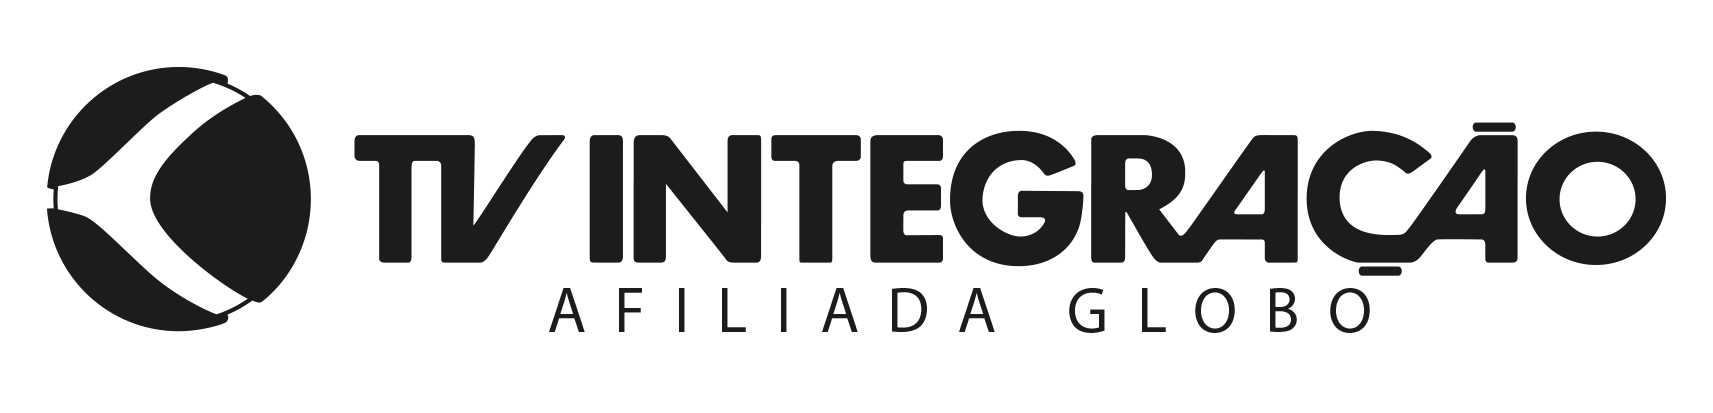 OGlobo TV Interacao Logo